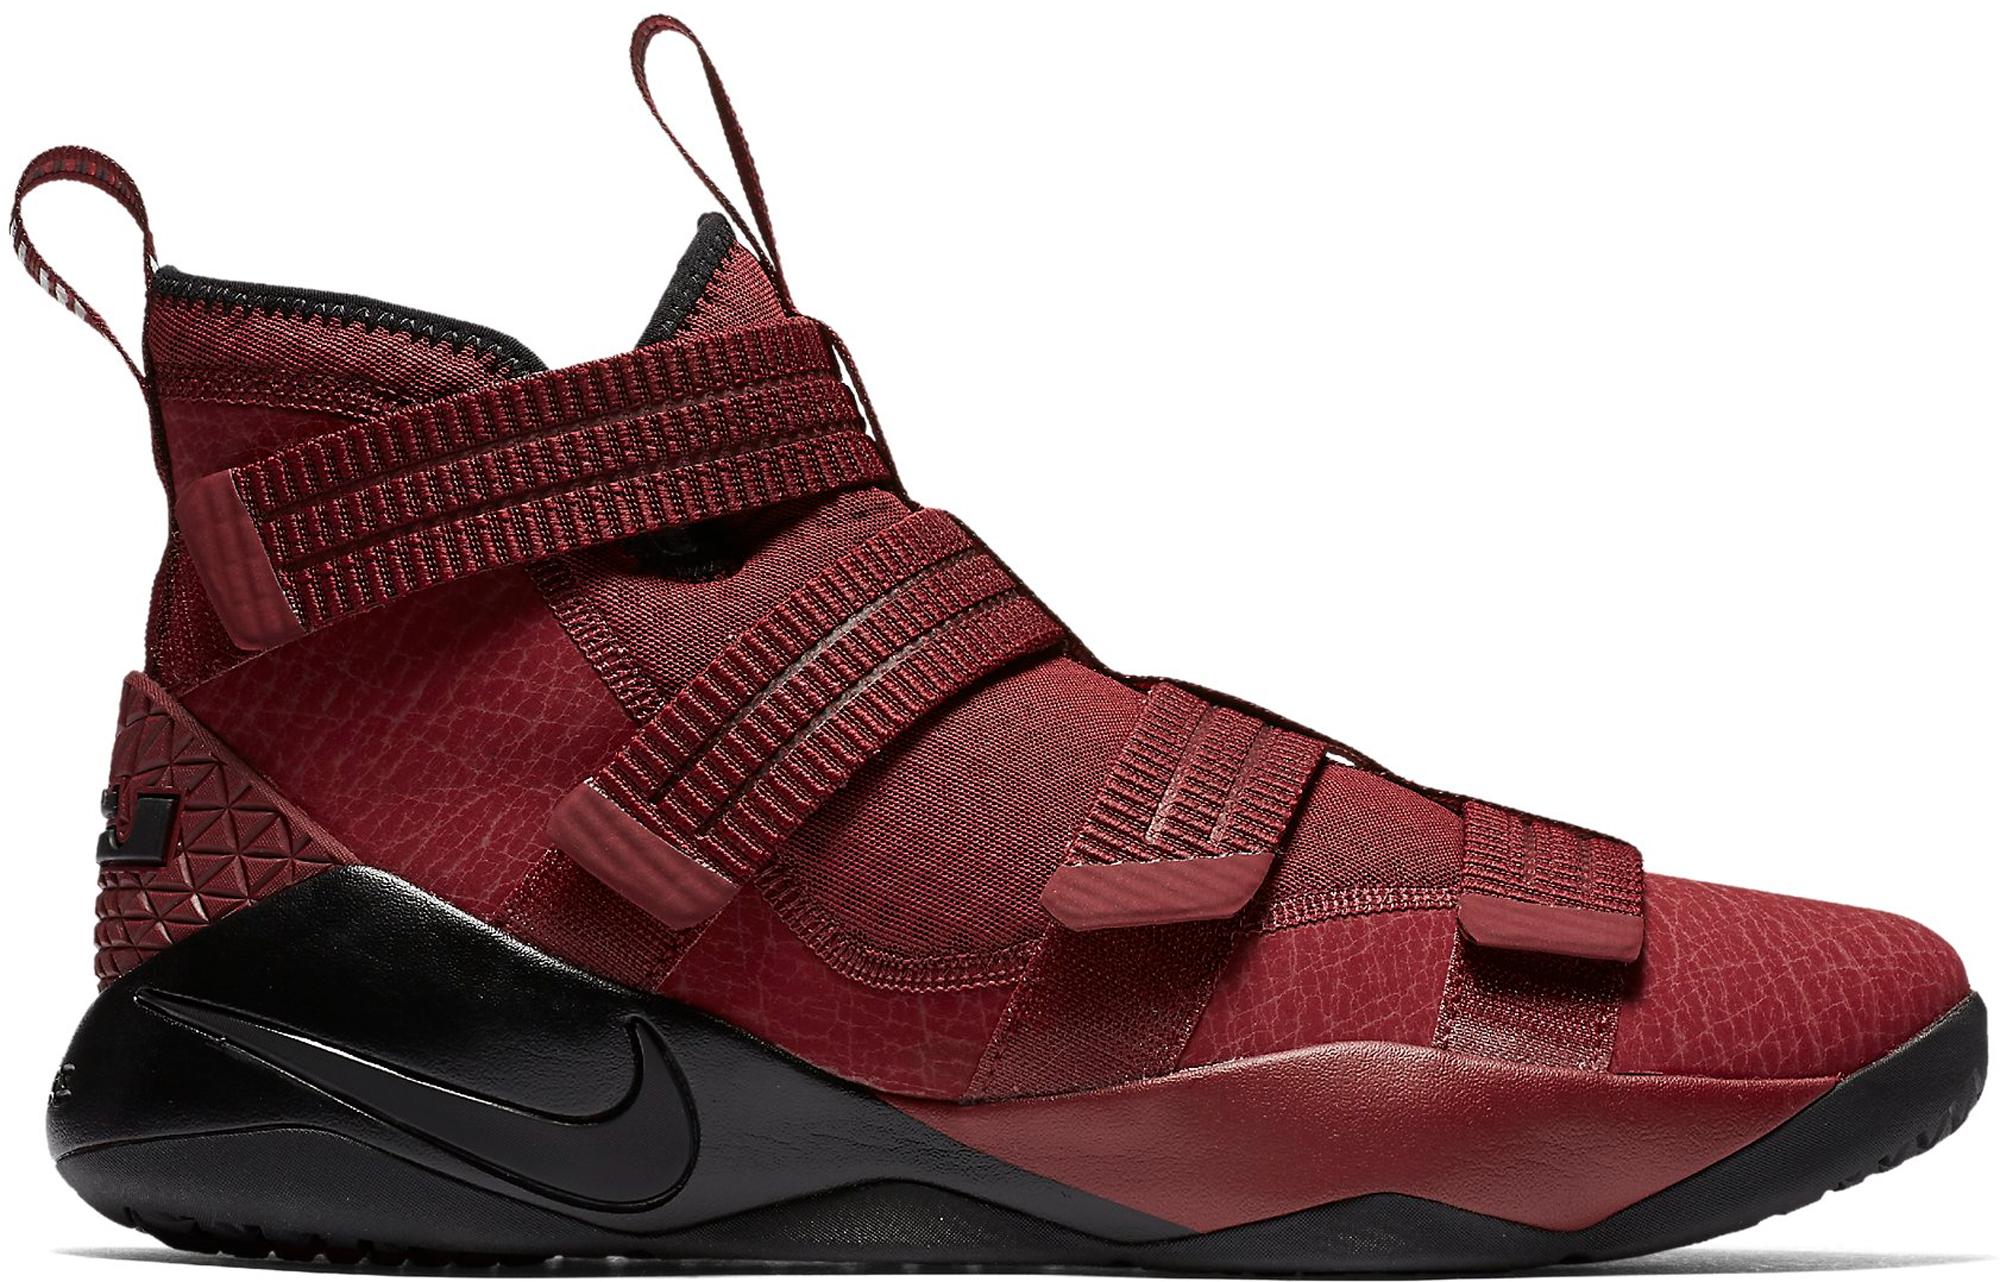 Nike LeBron Zoom Soldier 11 Burgundy